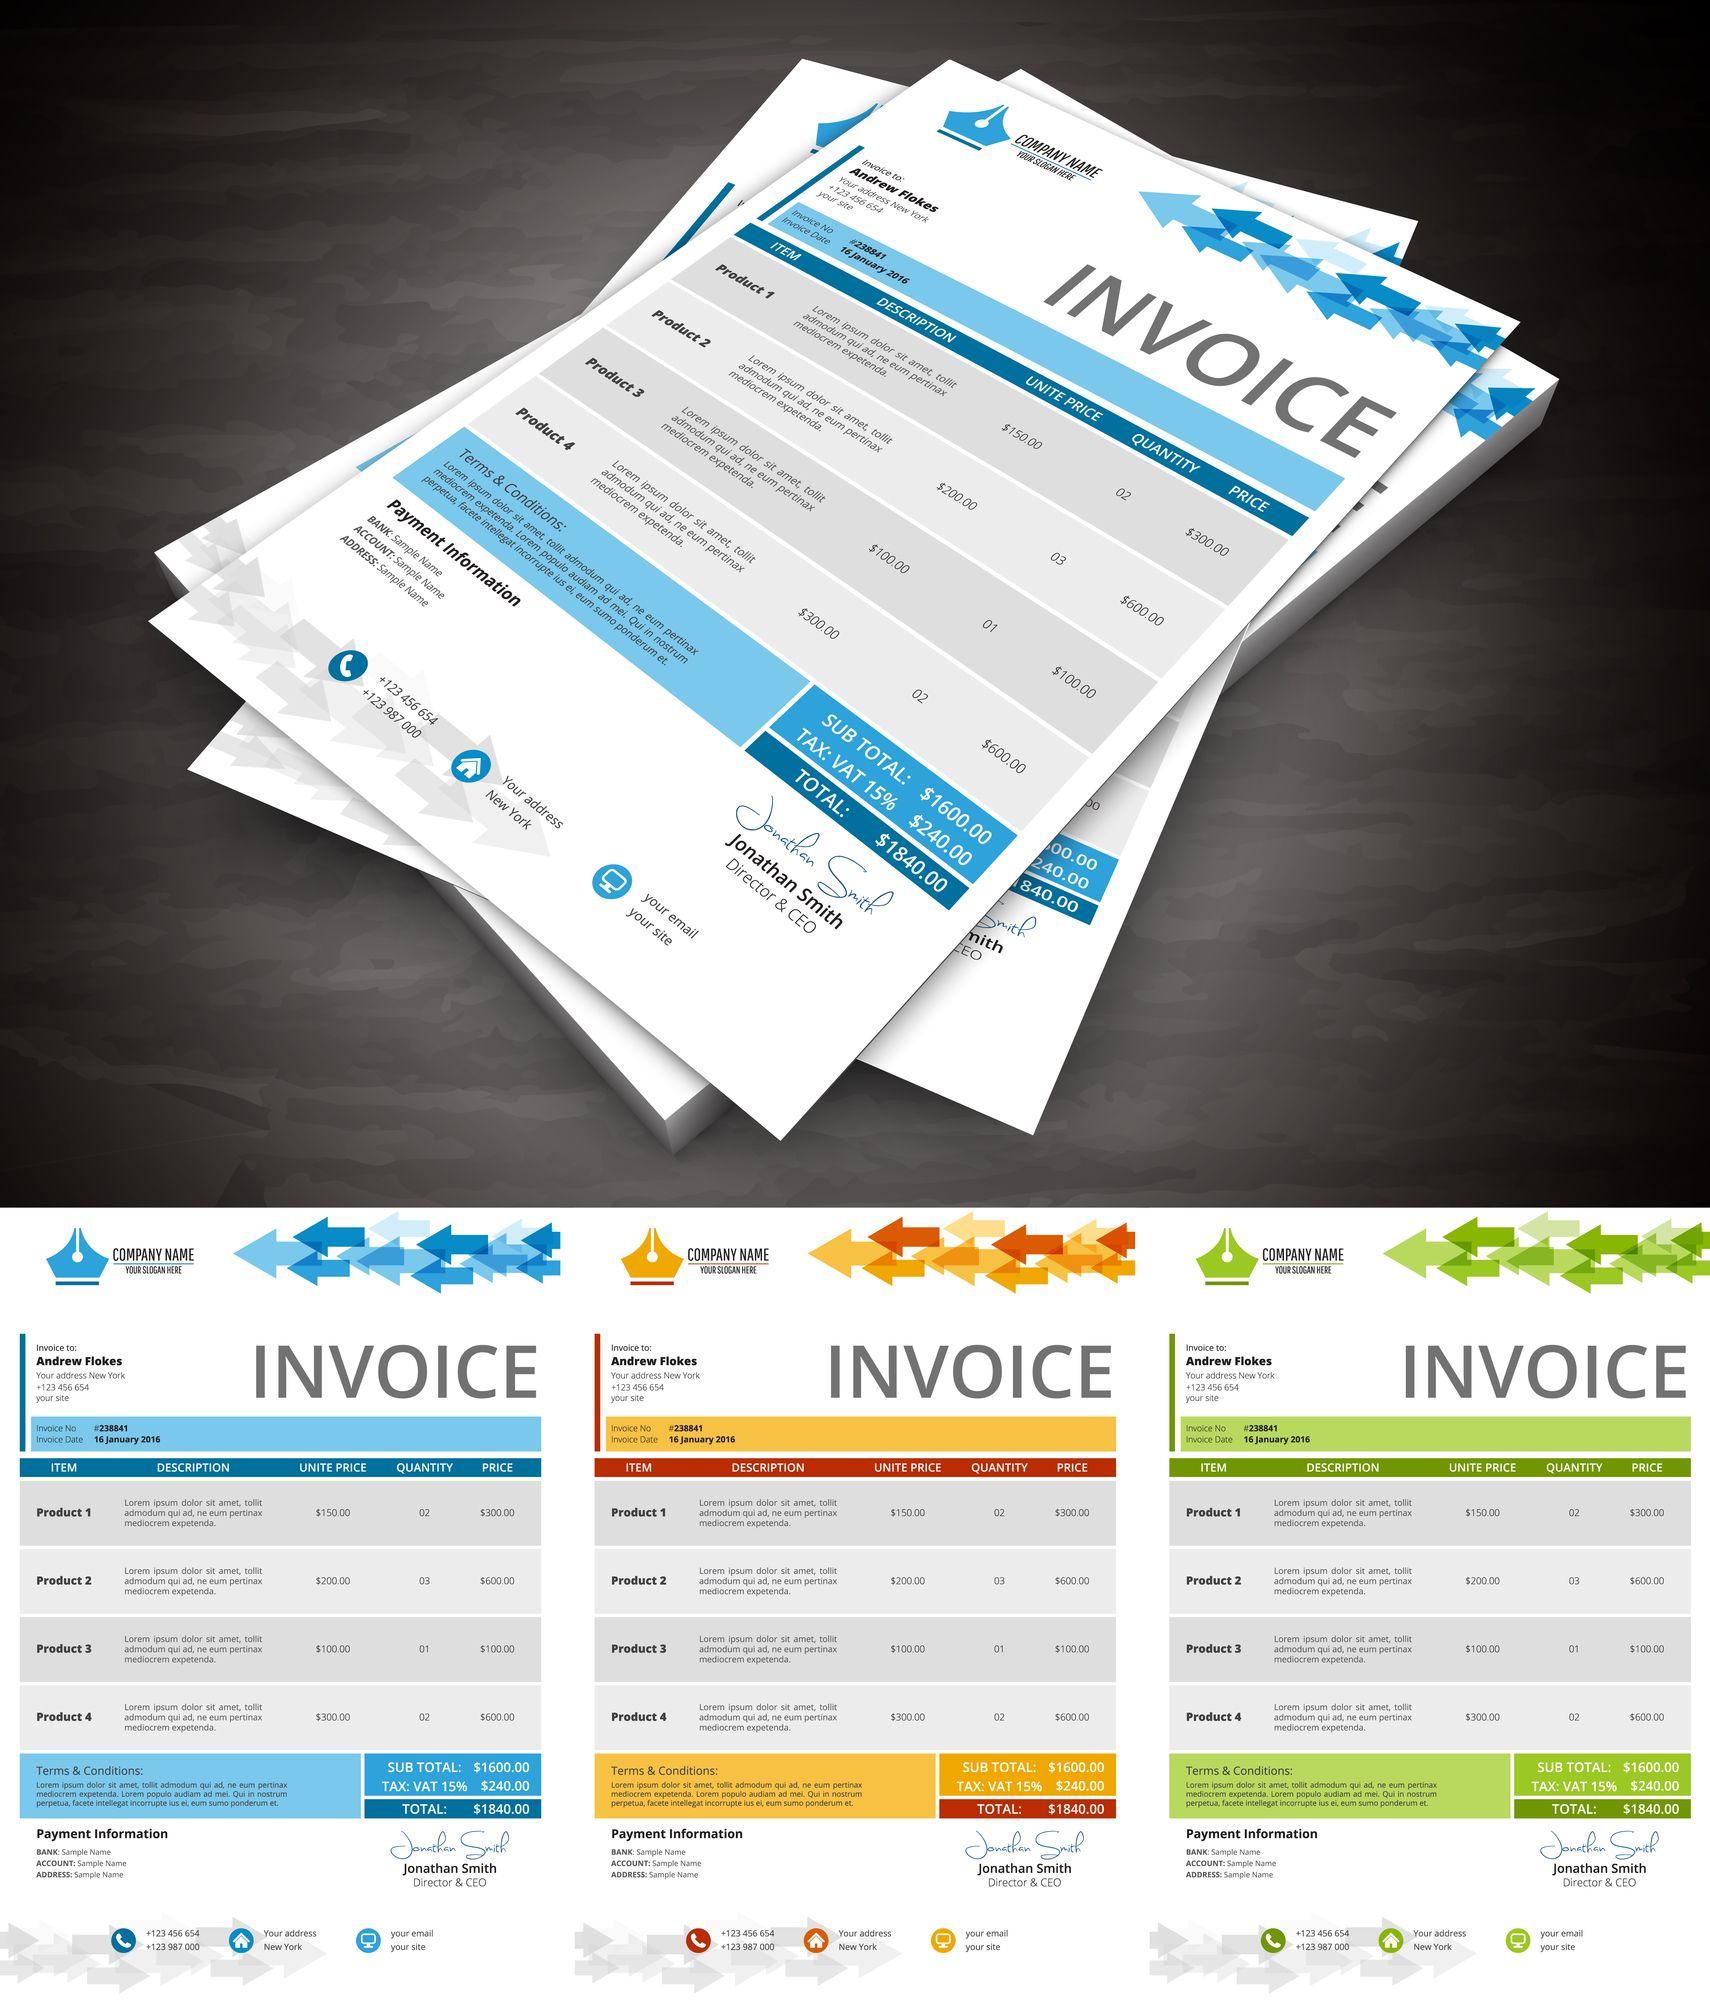 Invoice Template Mocd Skillsfuture Courses Singapore